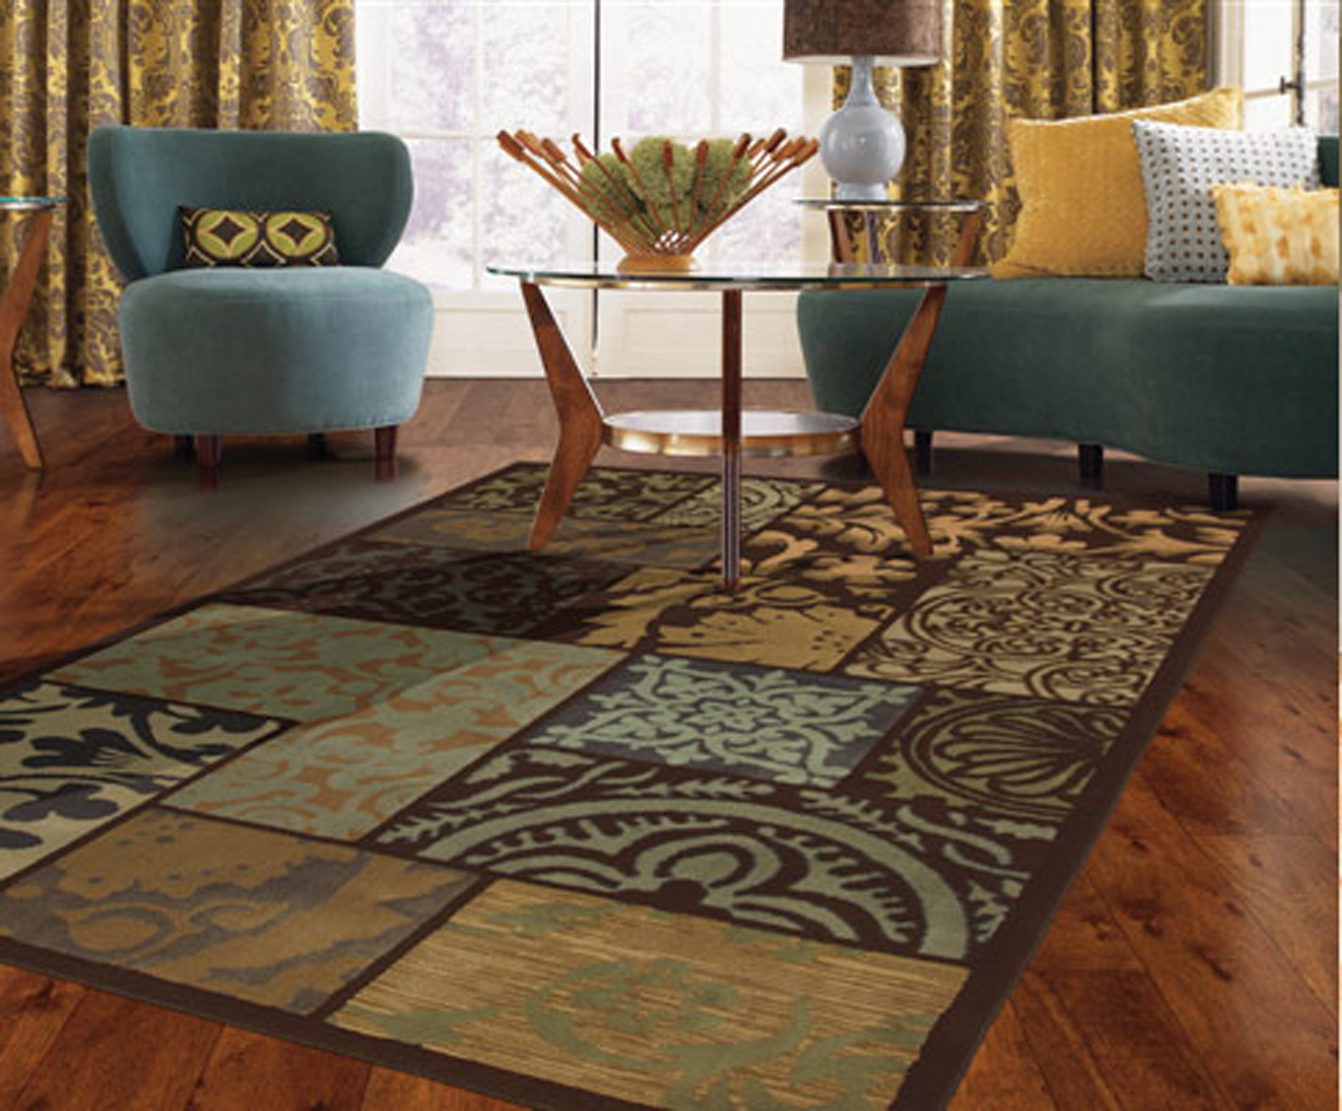 area carpet area rug UYPUFOV